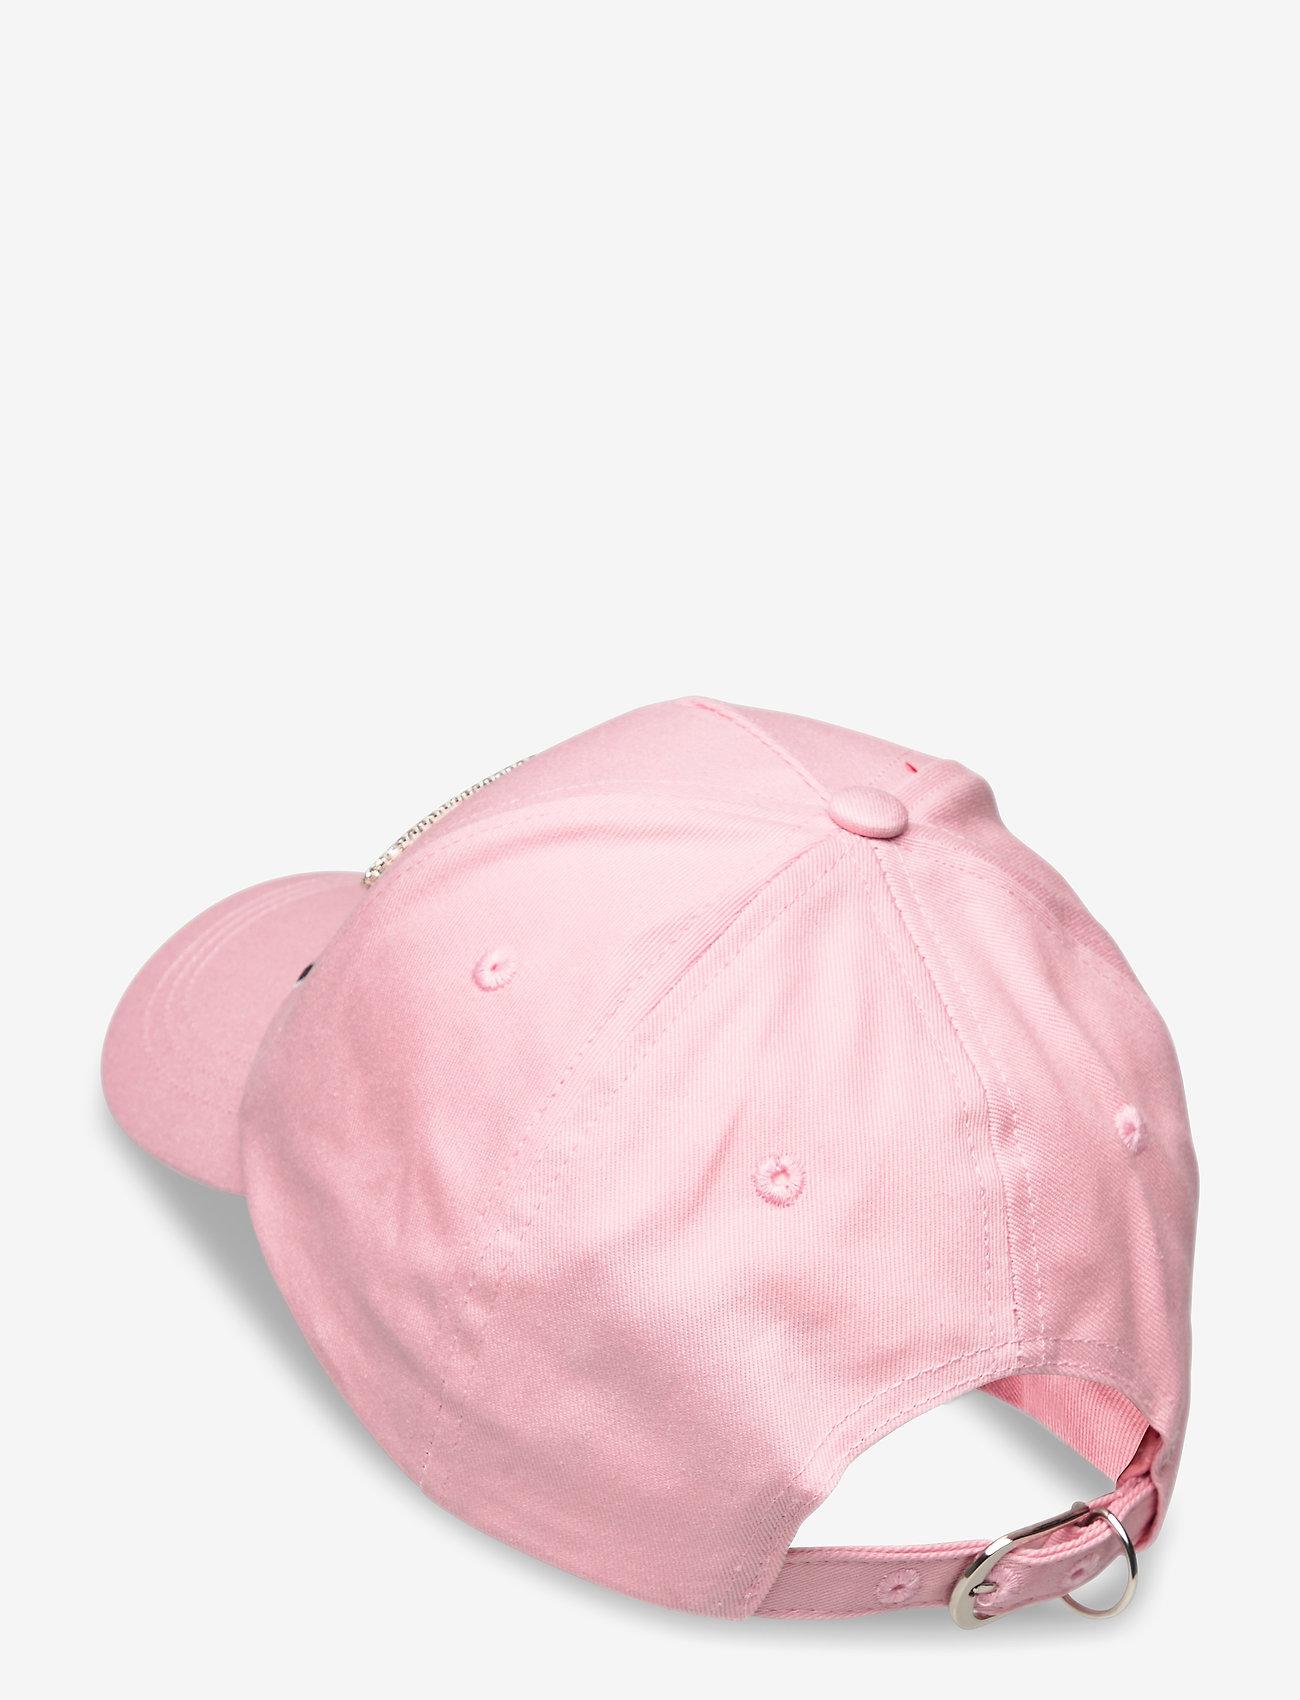 Portia Bright Cap (Glam Pink) (18.13 €) - GUESS Jeans TxV6n